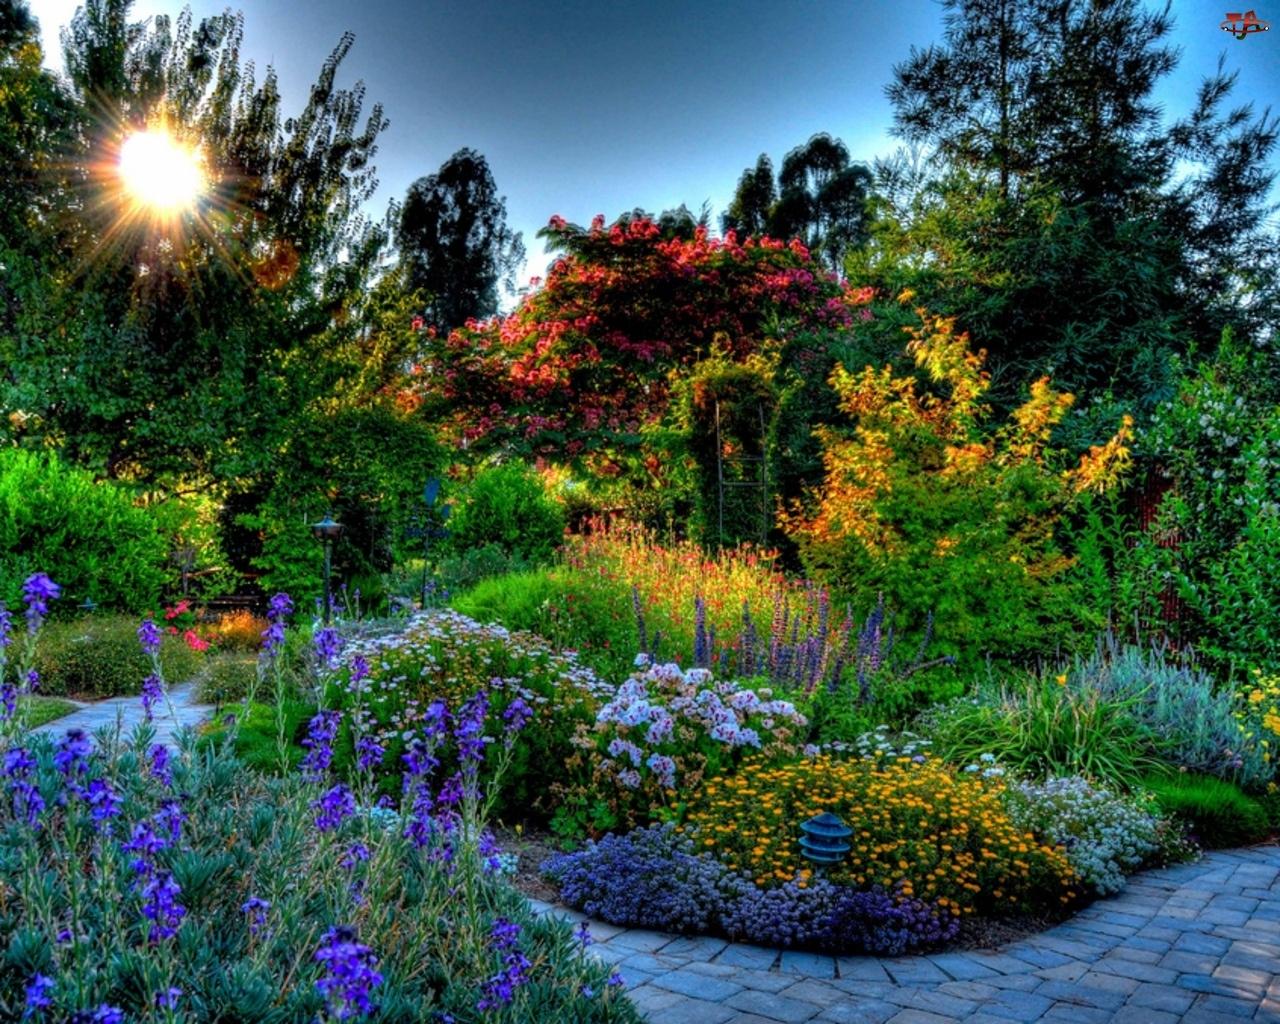 Słońce, Piękny, Ogród